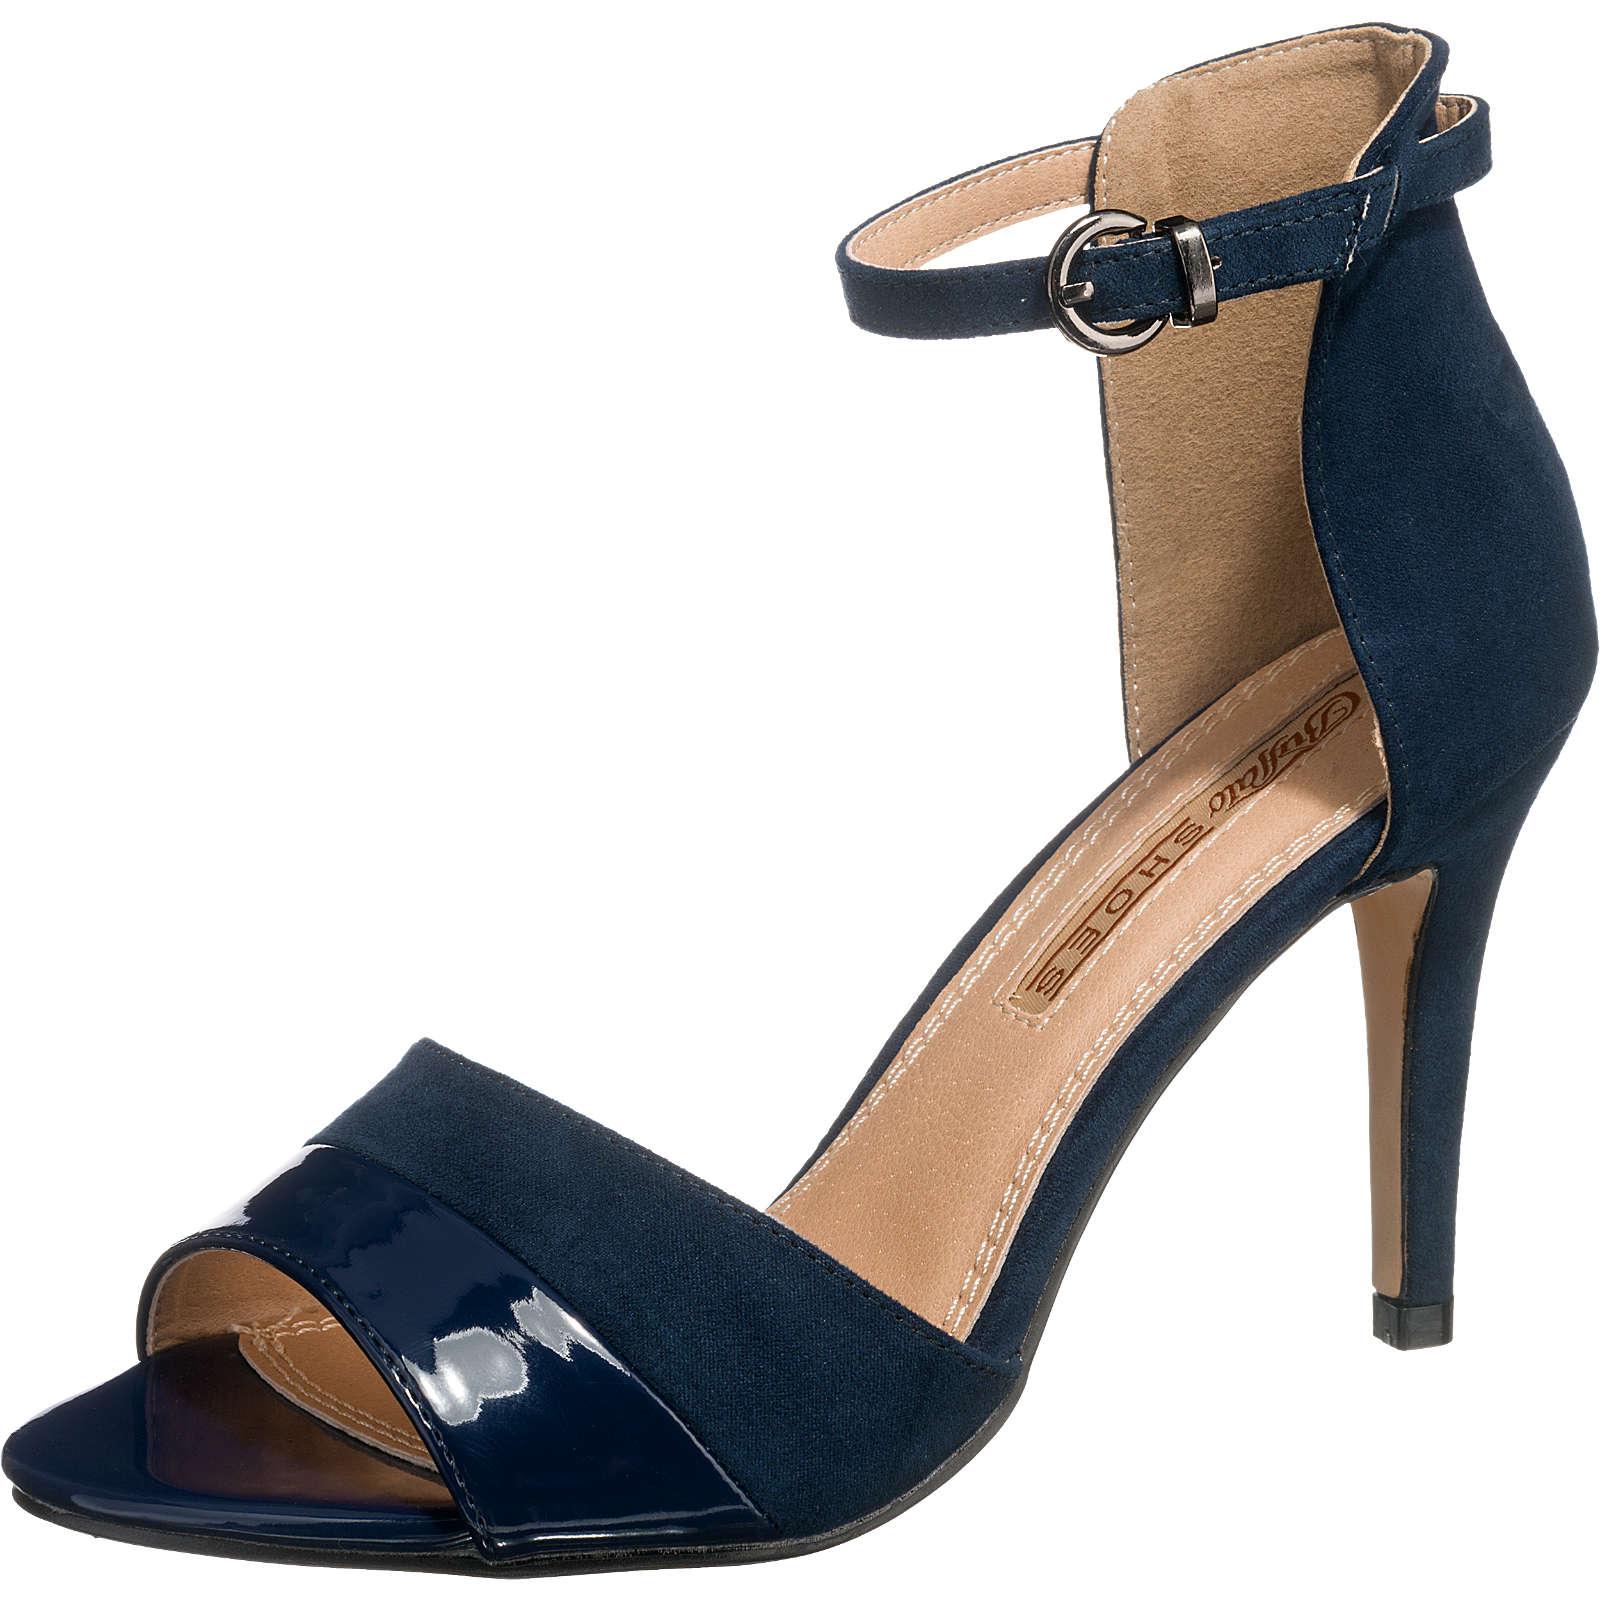 BUFFALO Sandaletten dunkelblau Damen Gr. 40